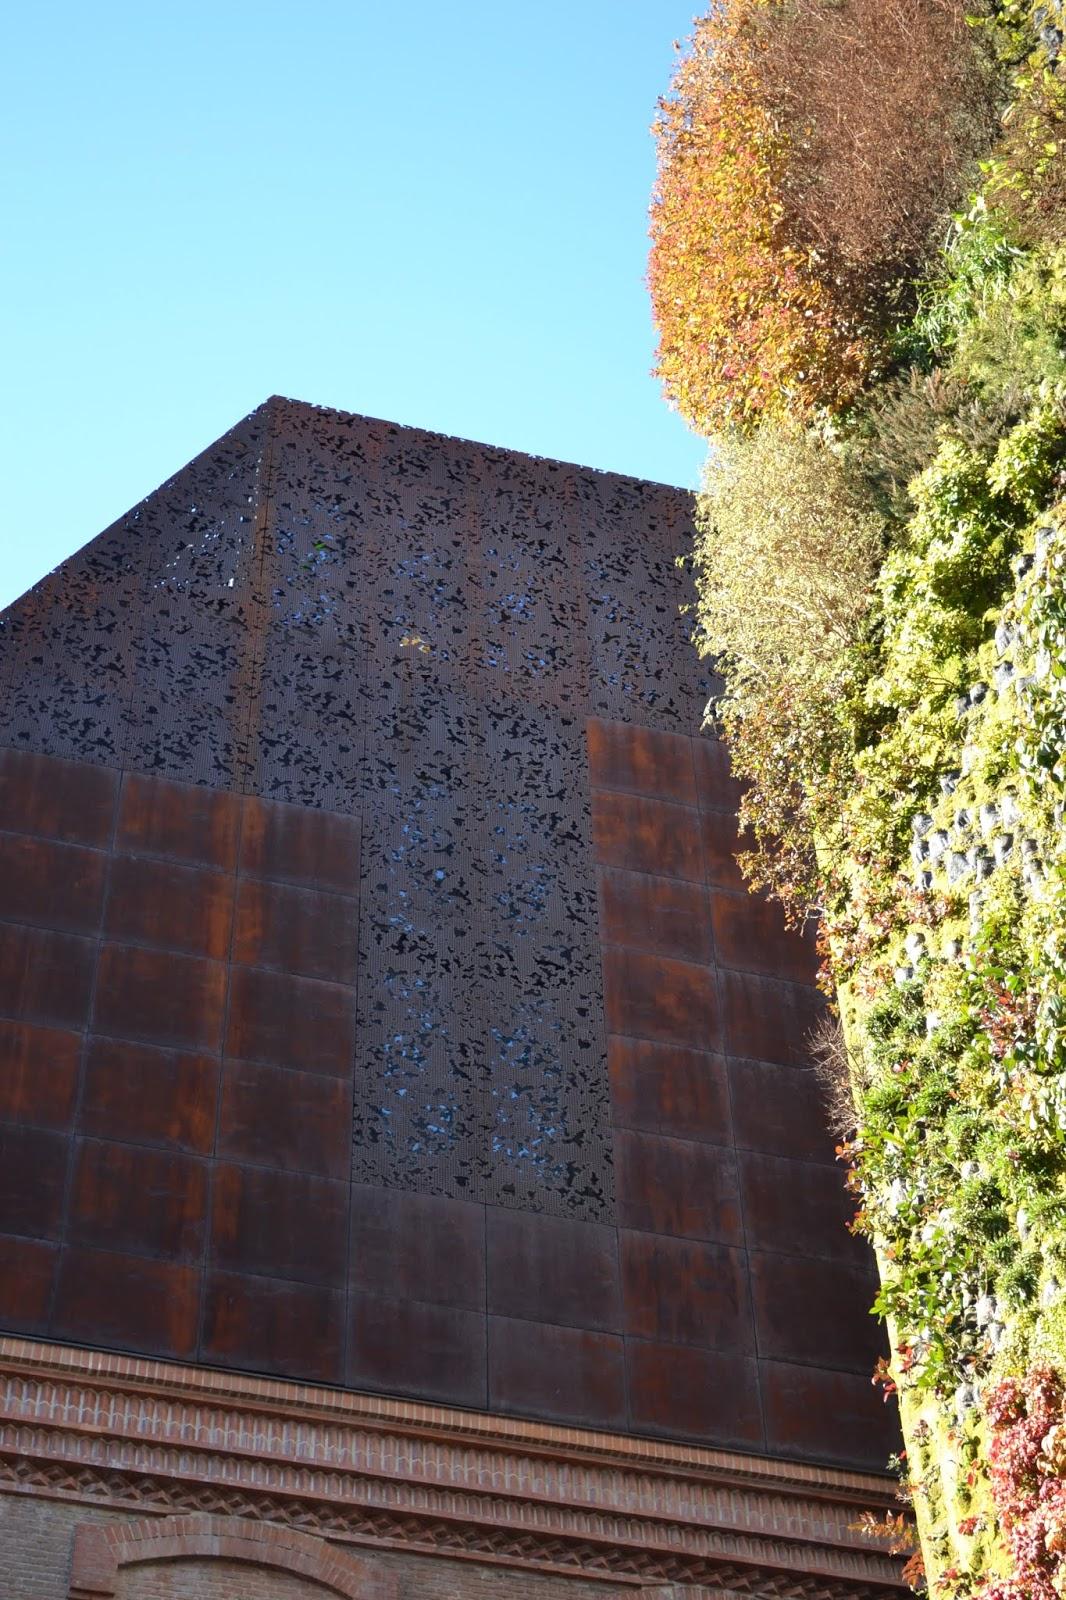 Architettura contemporanea Caixa Forum